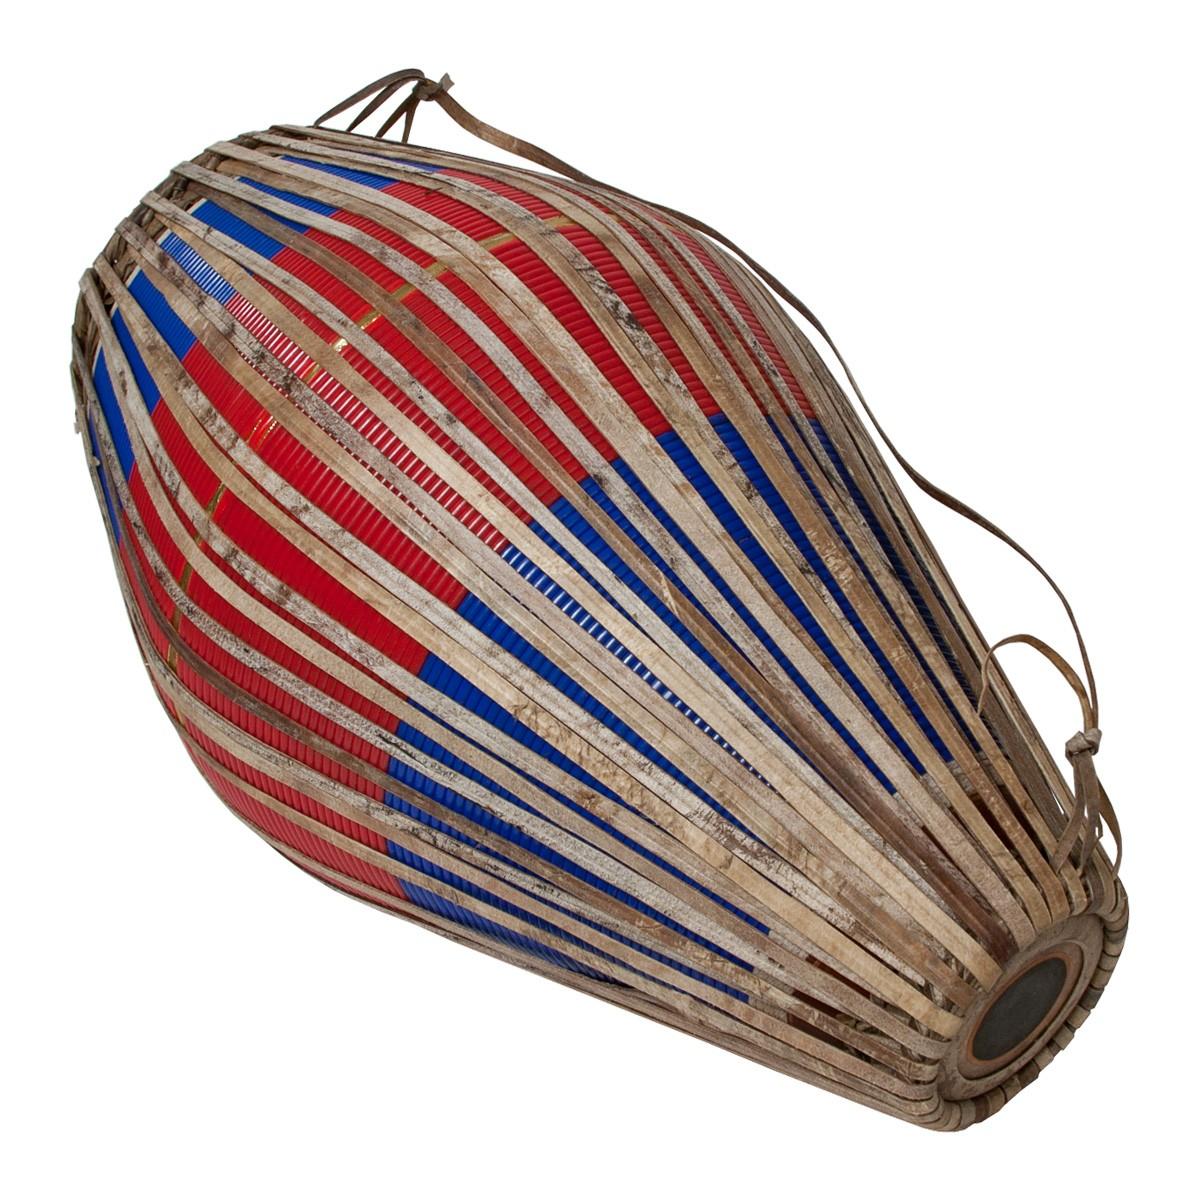 banjira Colorful Fiberglass Khol Drum